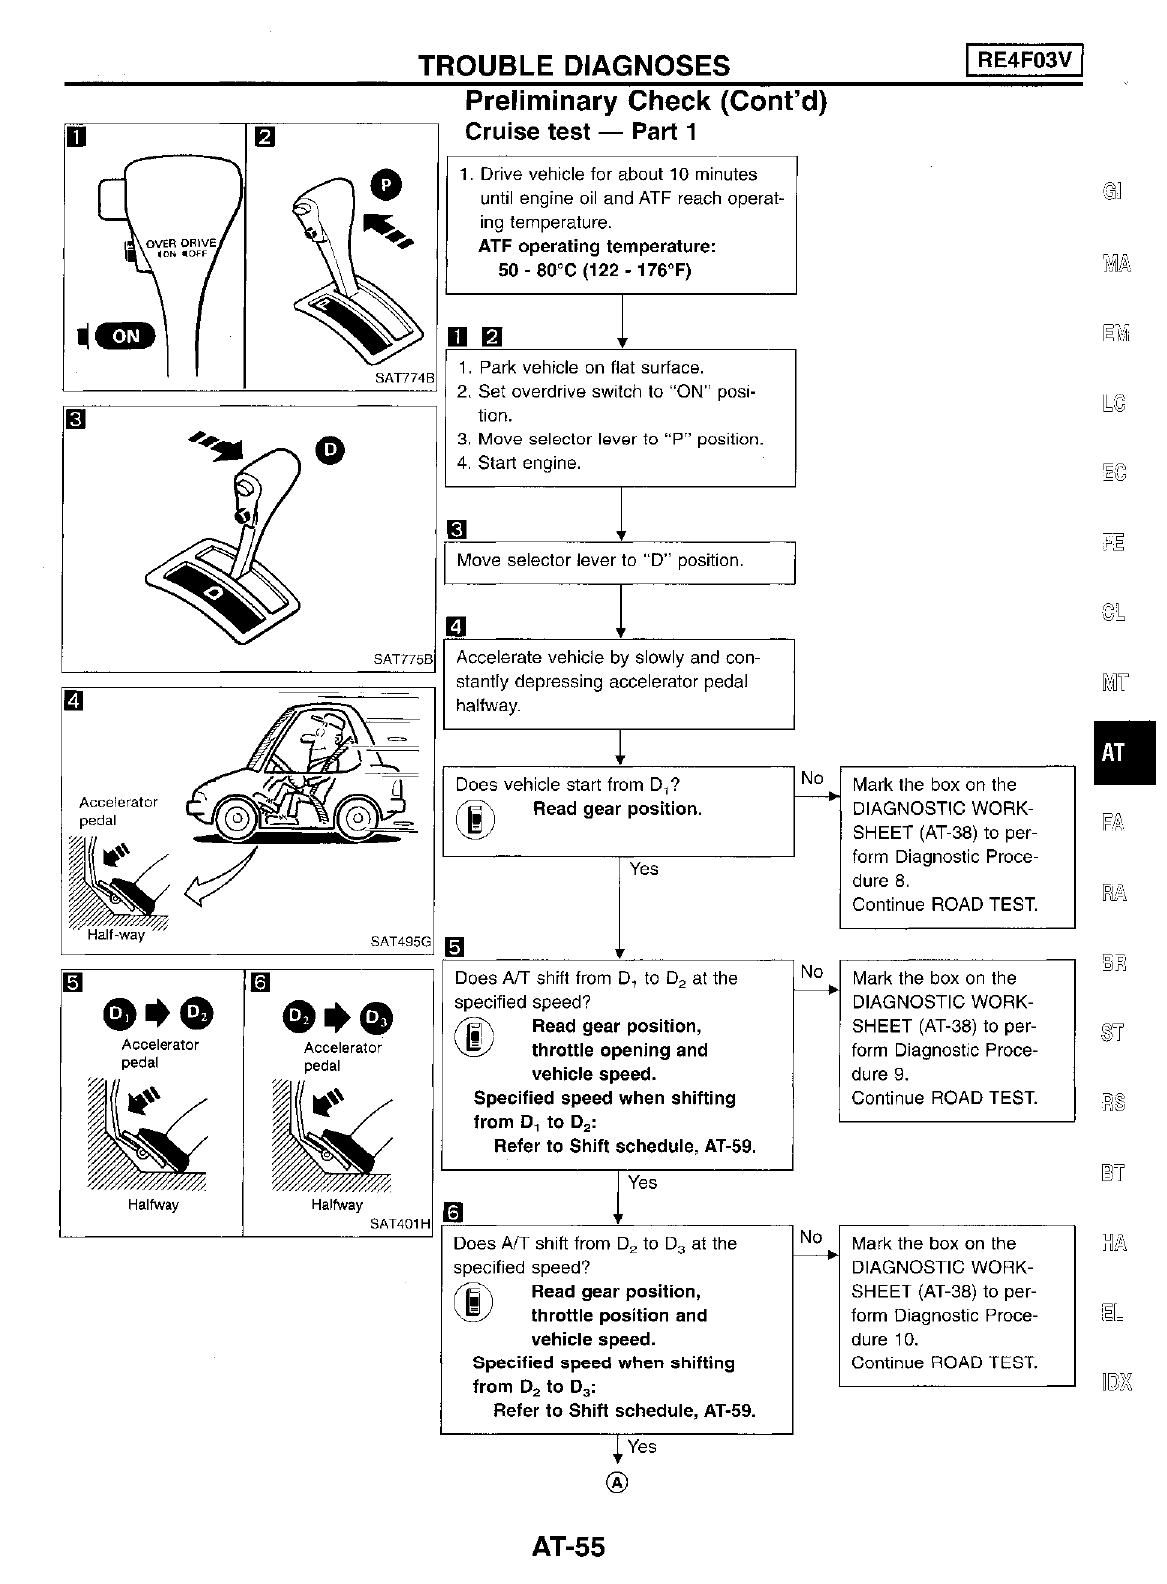 Product Detail Manual At Stick Shift Shifting Gears Illustration Diagram 831